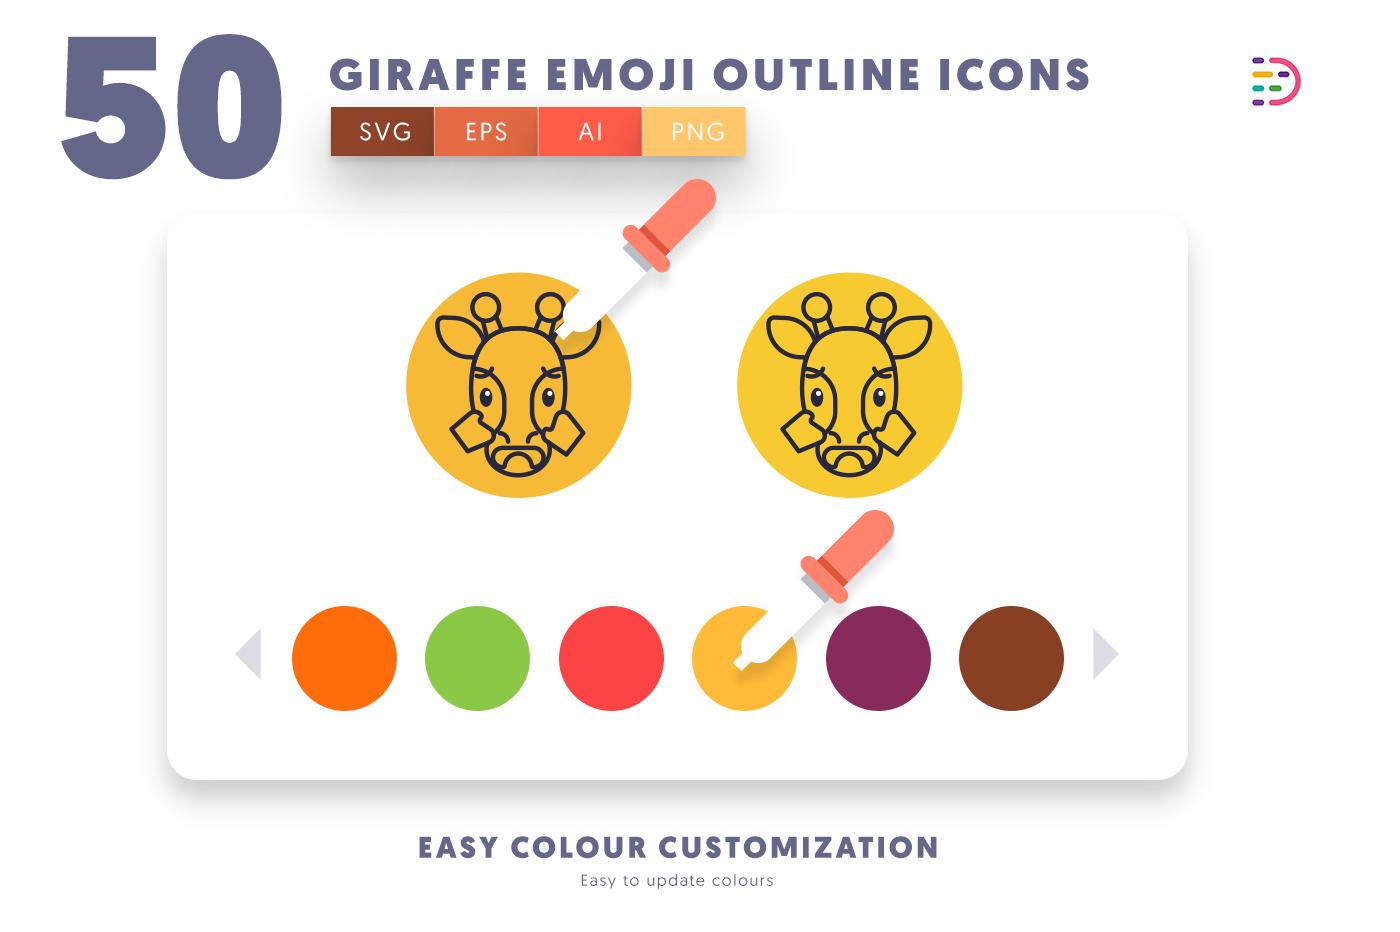 Customizable and vector 50 Giraffe Emoji Outline Icons